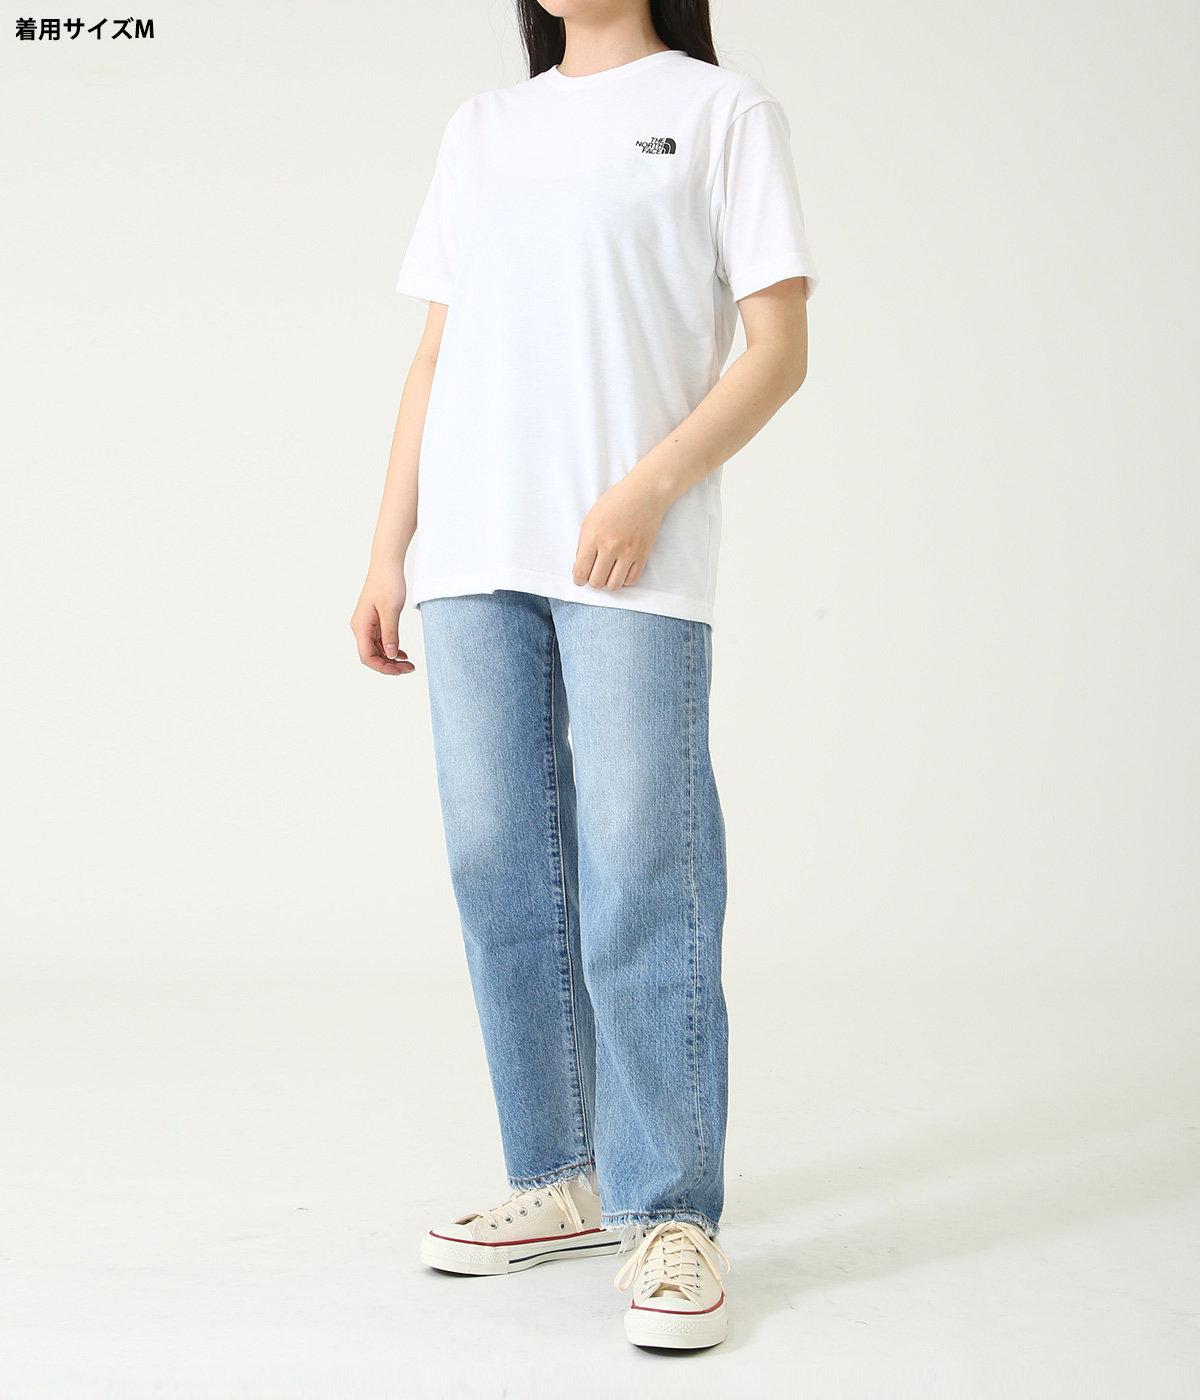 model(157cm) 着用サイズ:M